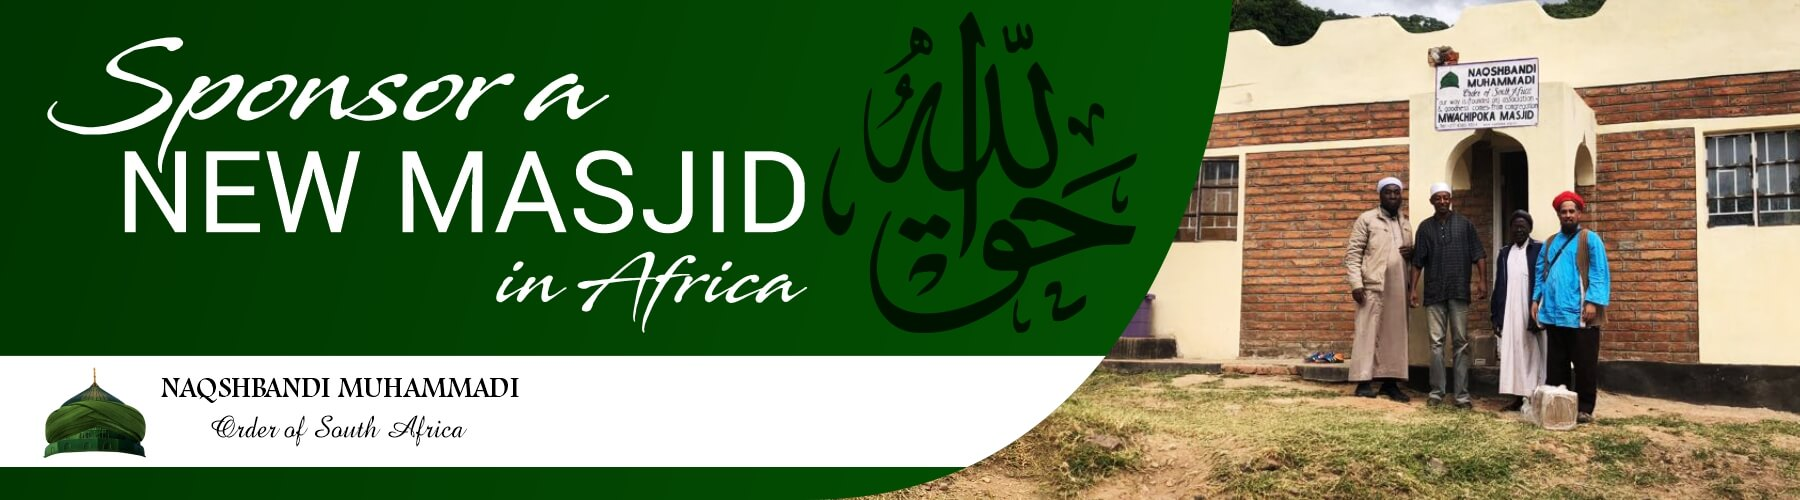 Masjid-banner